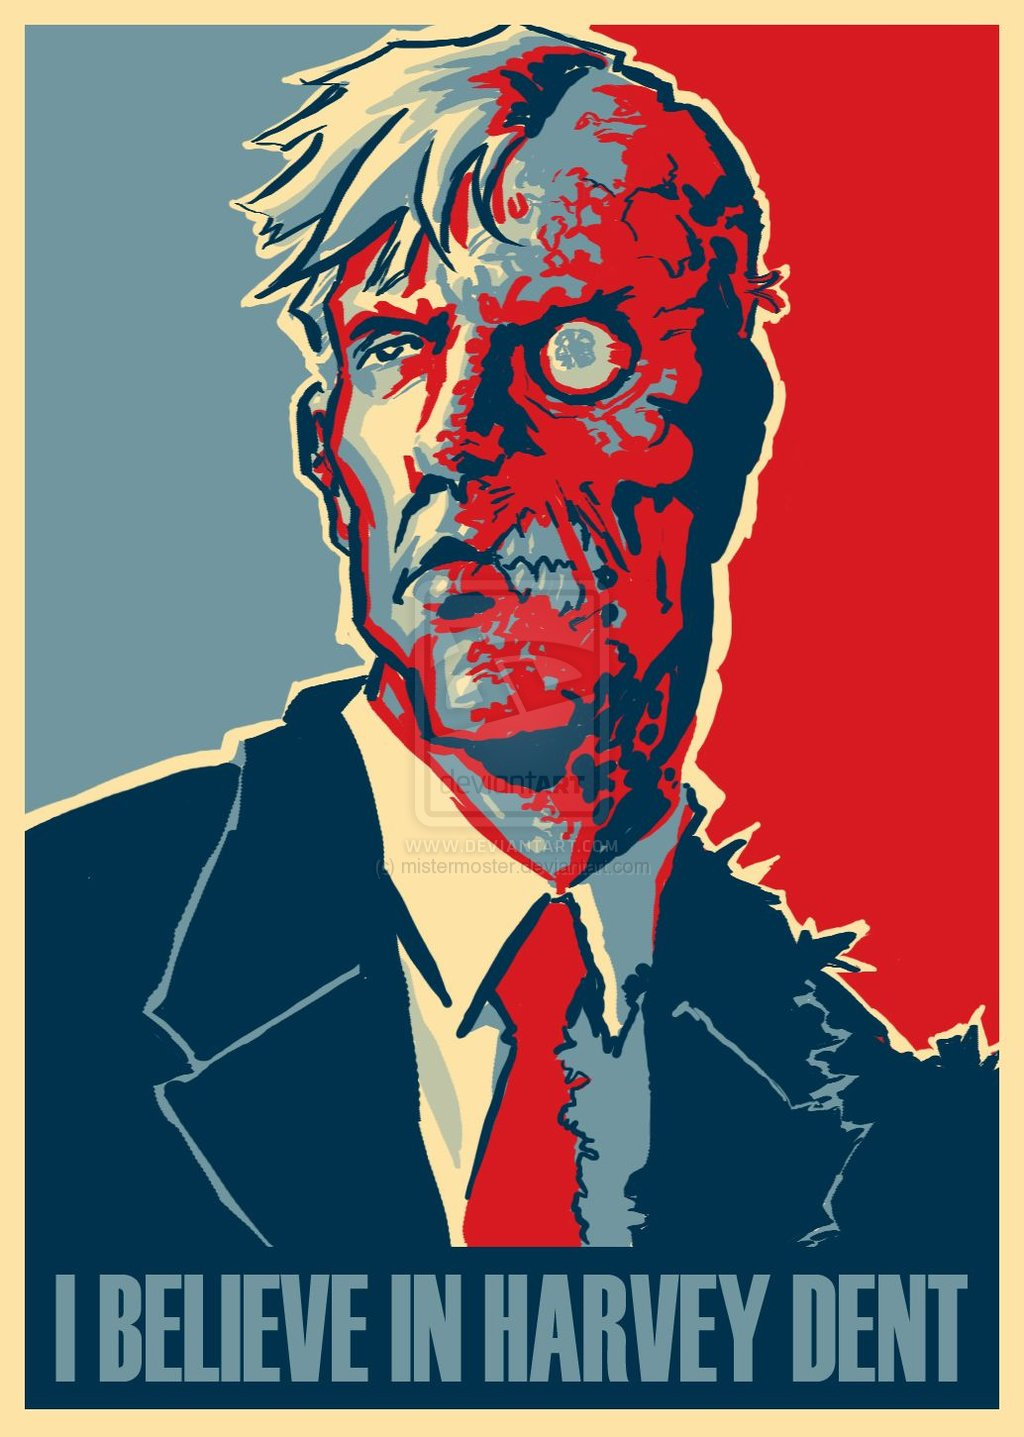 Harvey Dent New Earth: Nerdovore: I Believe In Harvey Dent